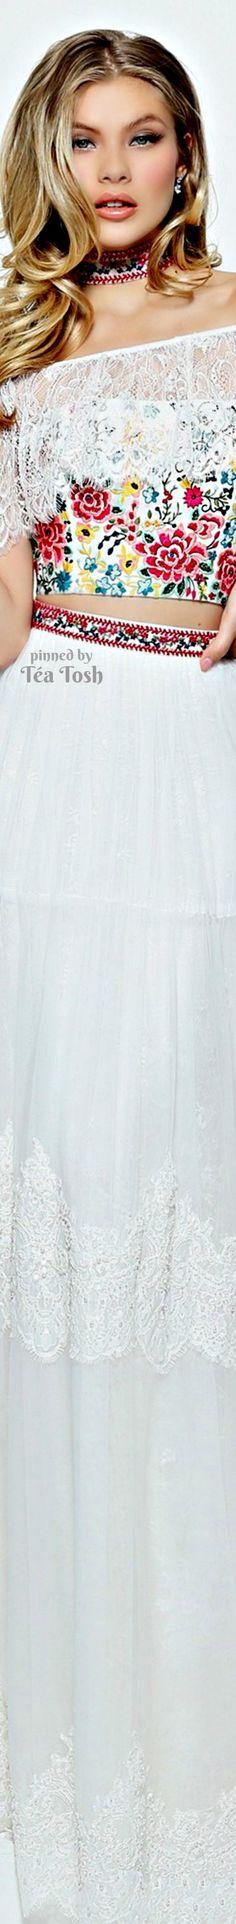 ❇Téa Tosh❇ Sherri Hill Designer Prom Dresses, Designer Gowns, Floral Fashion, Colorful Fashion, Prom Dress Couture, Long Evening Gowns, Estilo Fashion, Sherri Hill, American Women